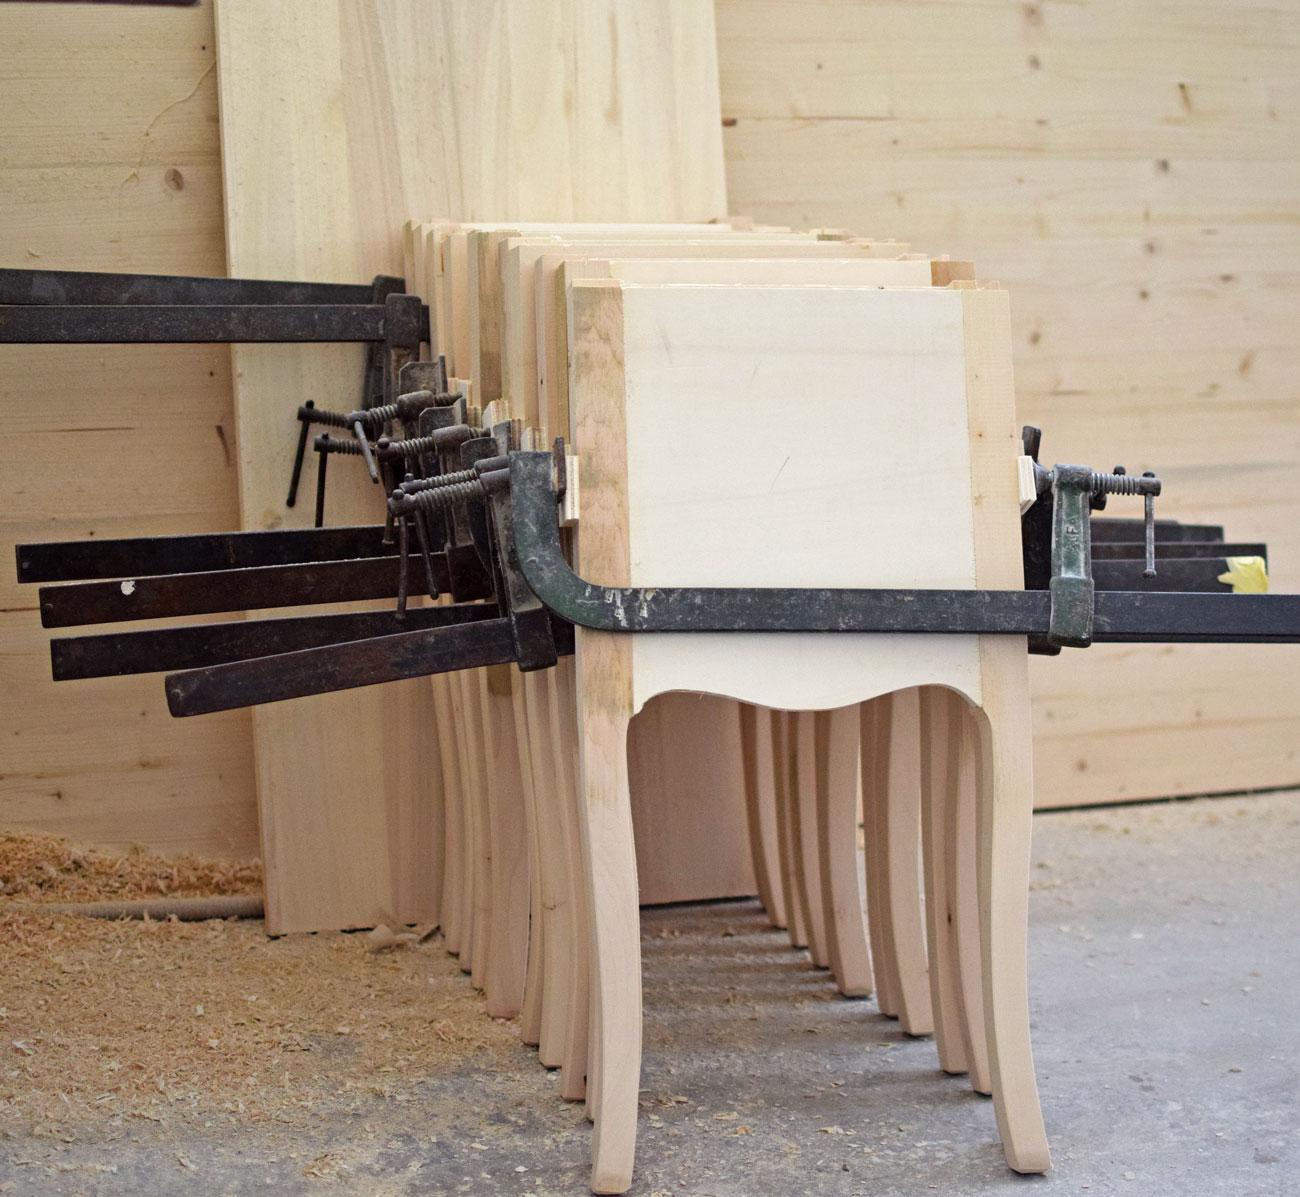 Mobili bernardi Jari crea un prodotto artigianale esclusivo